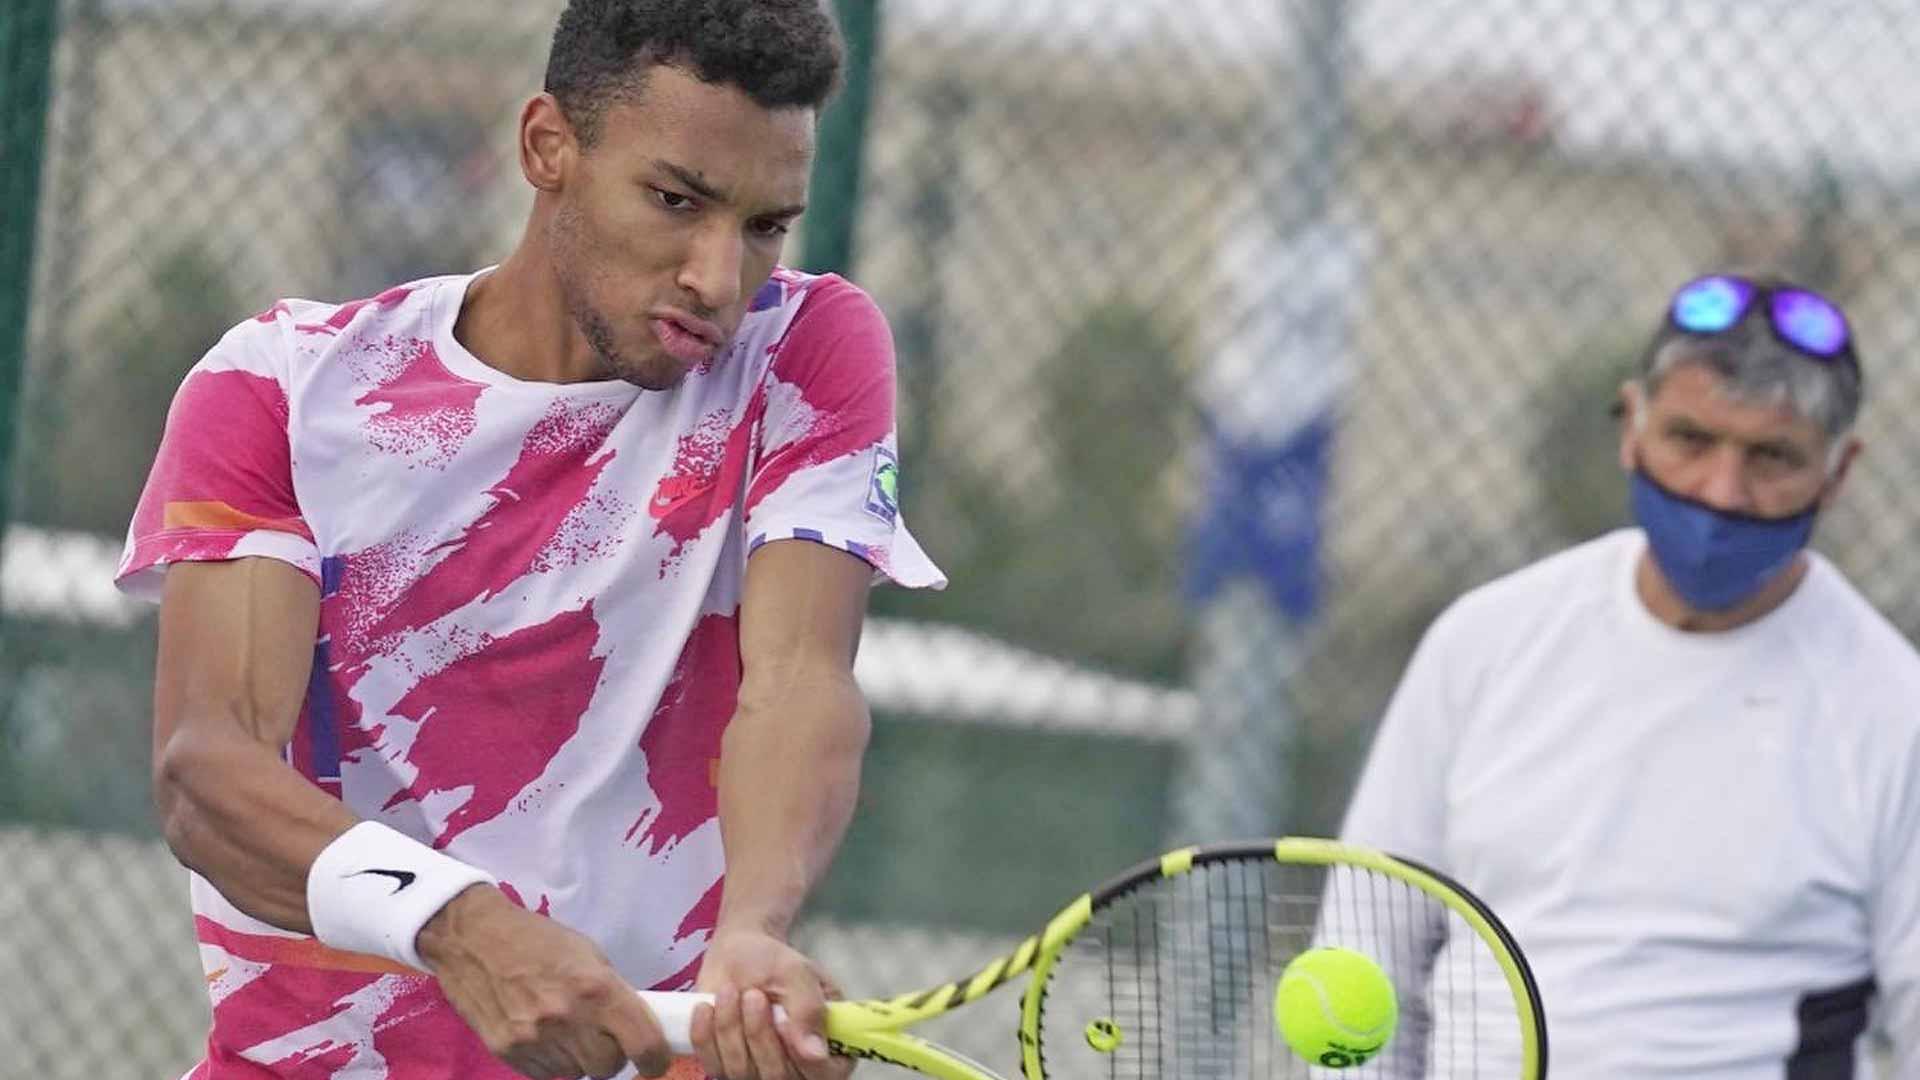 Felix Auger-Aliassime, Toni Nadal